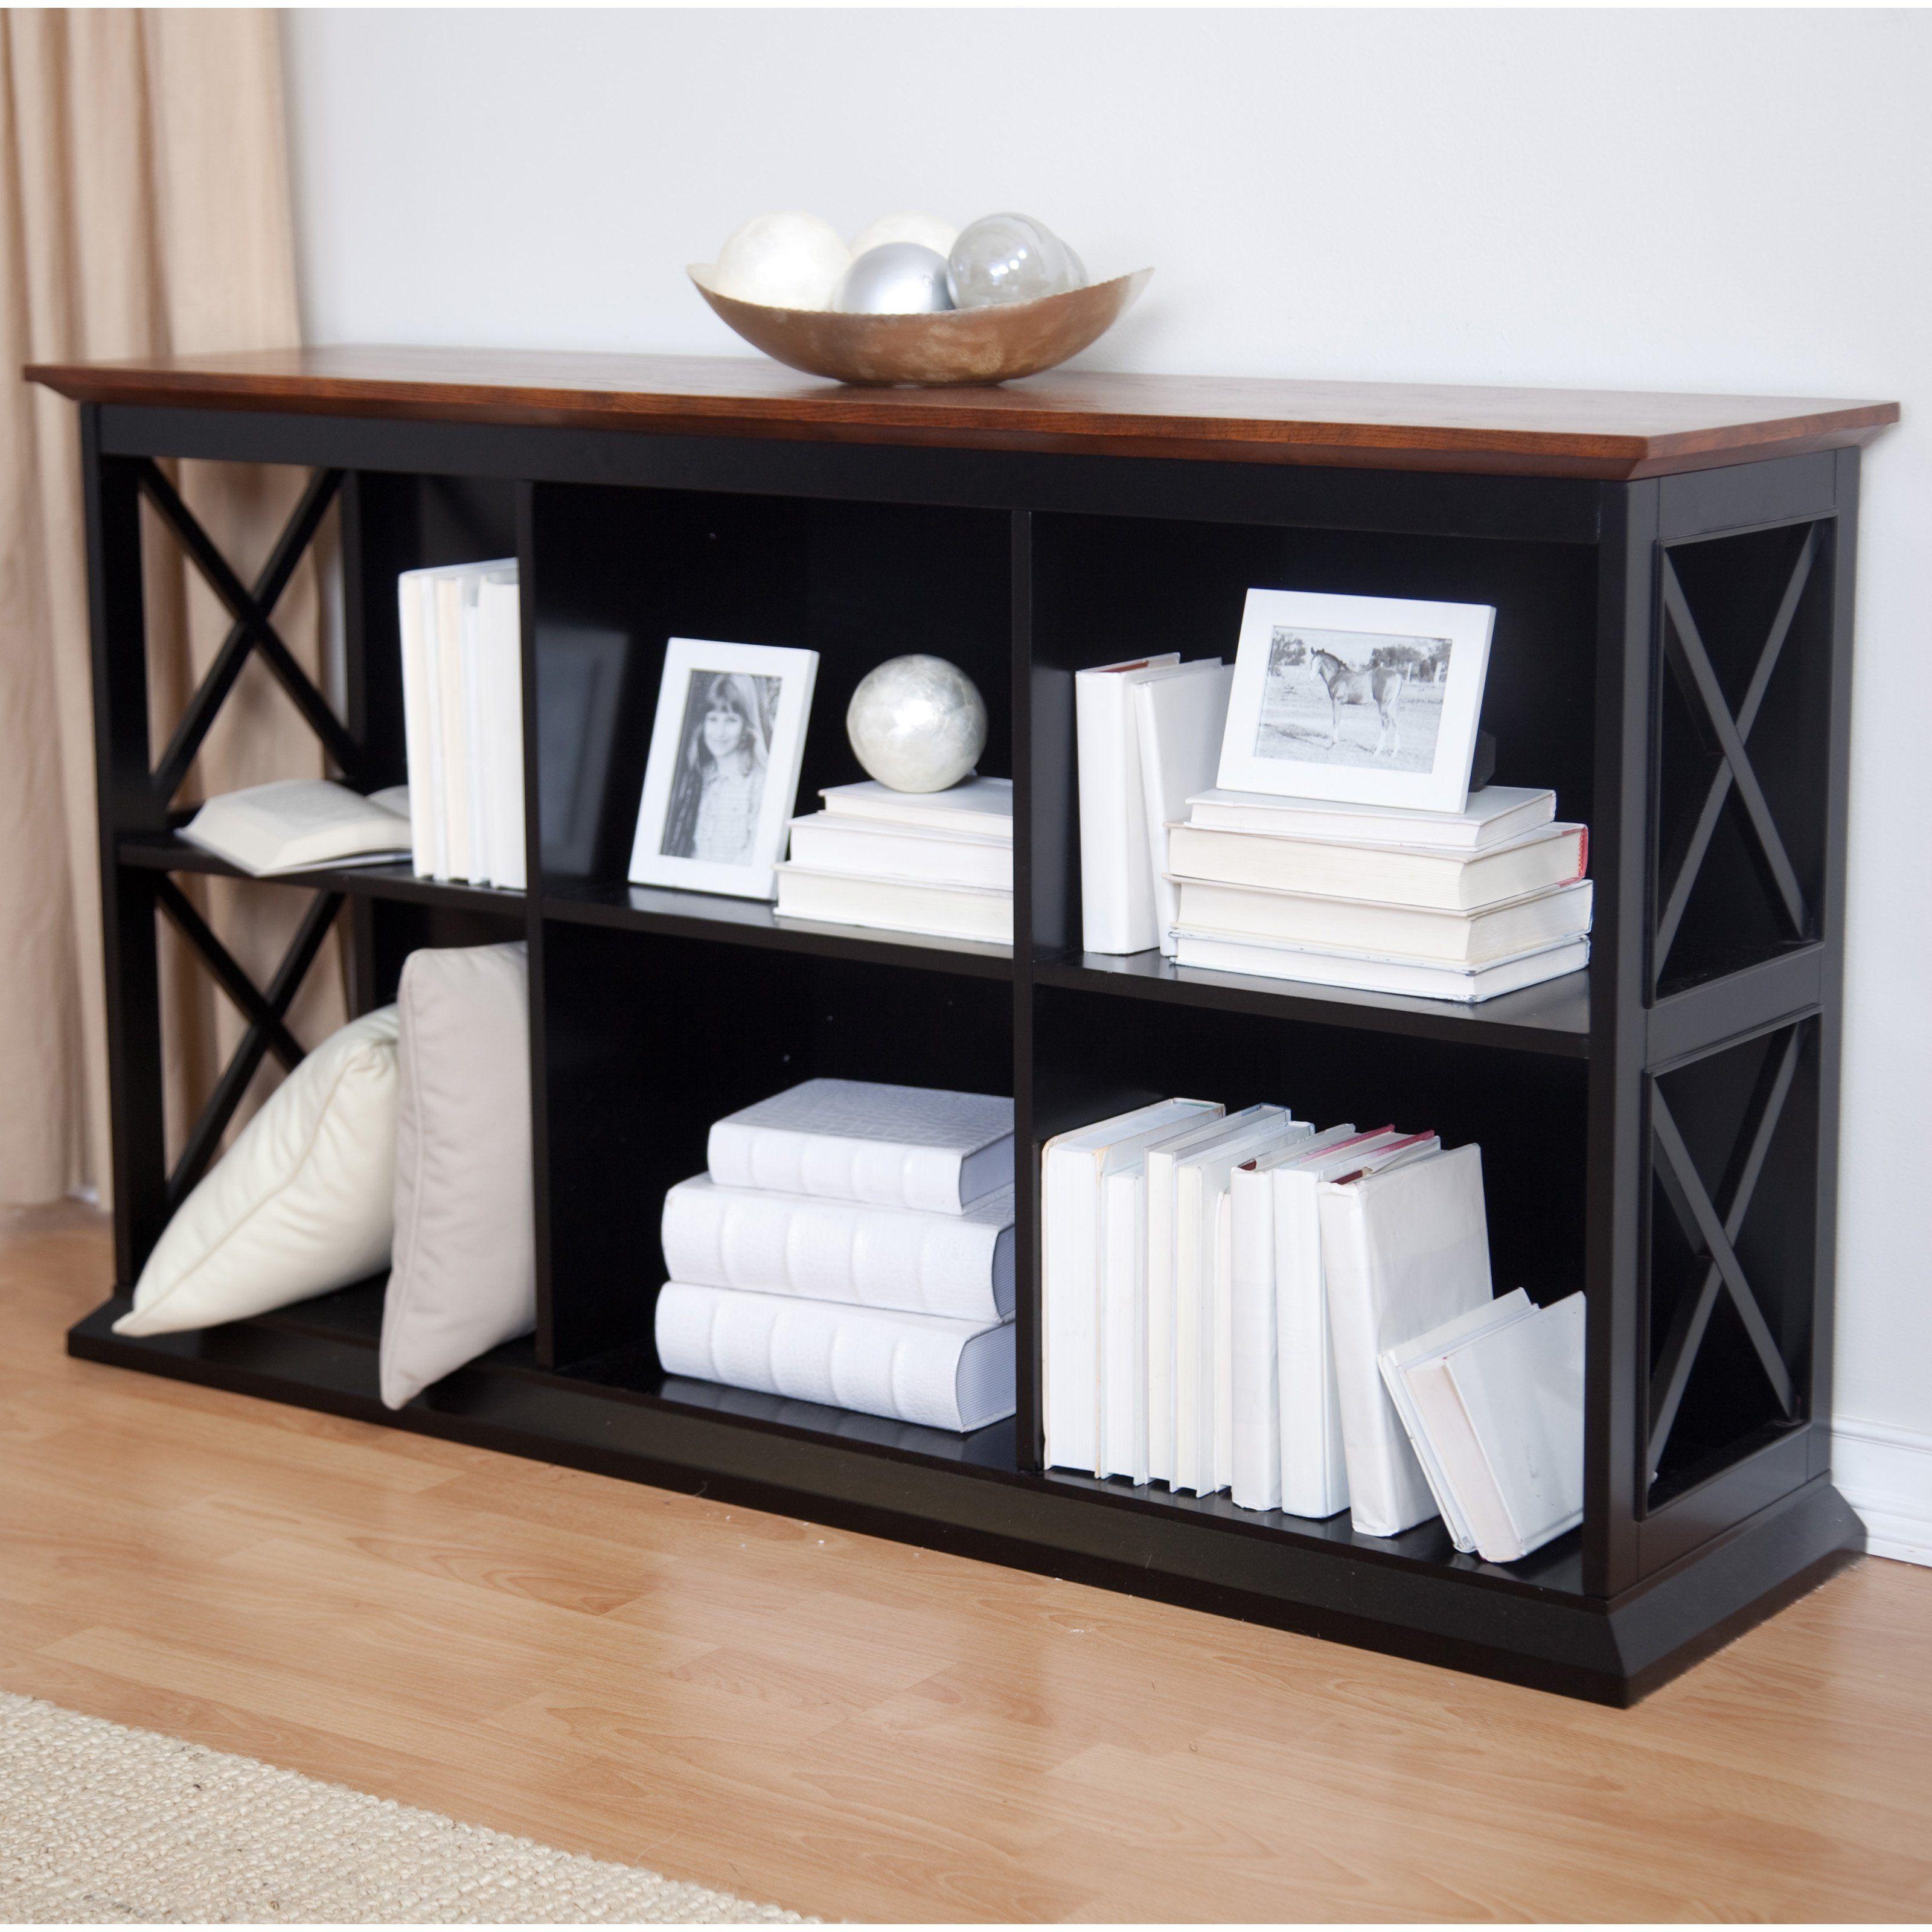 The Hampton Console Table Stackable Bookcase - Black/Oak ...